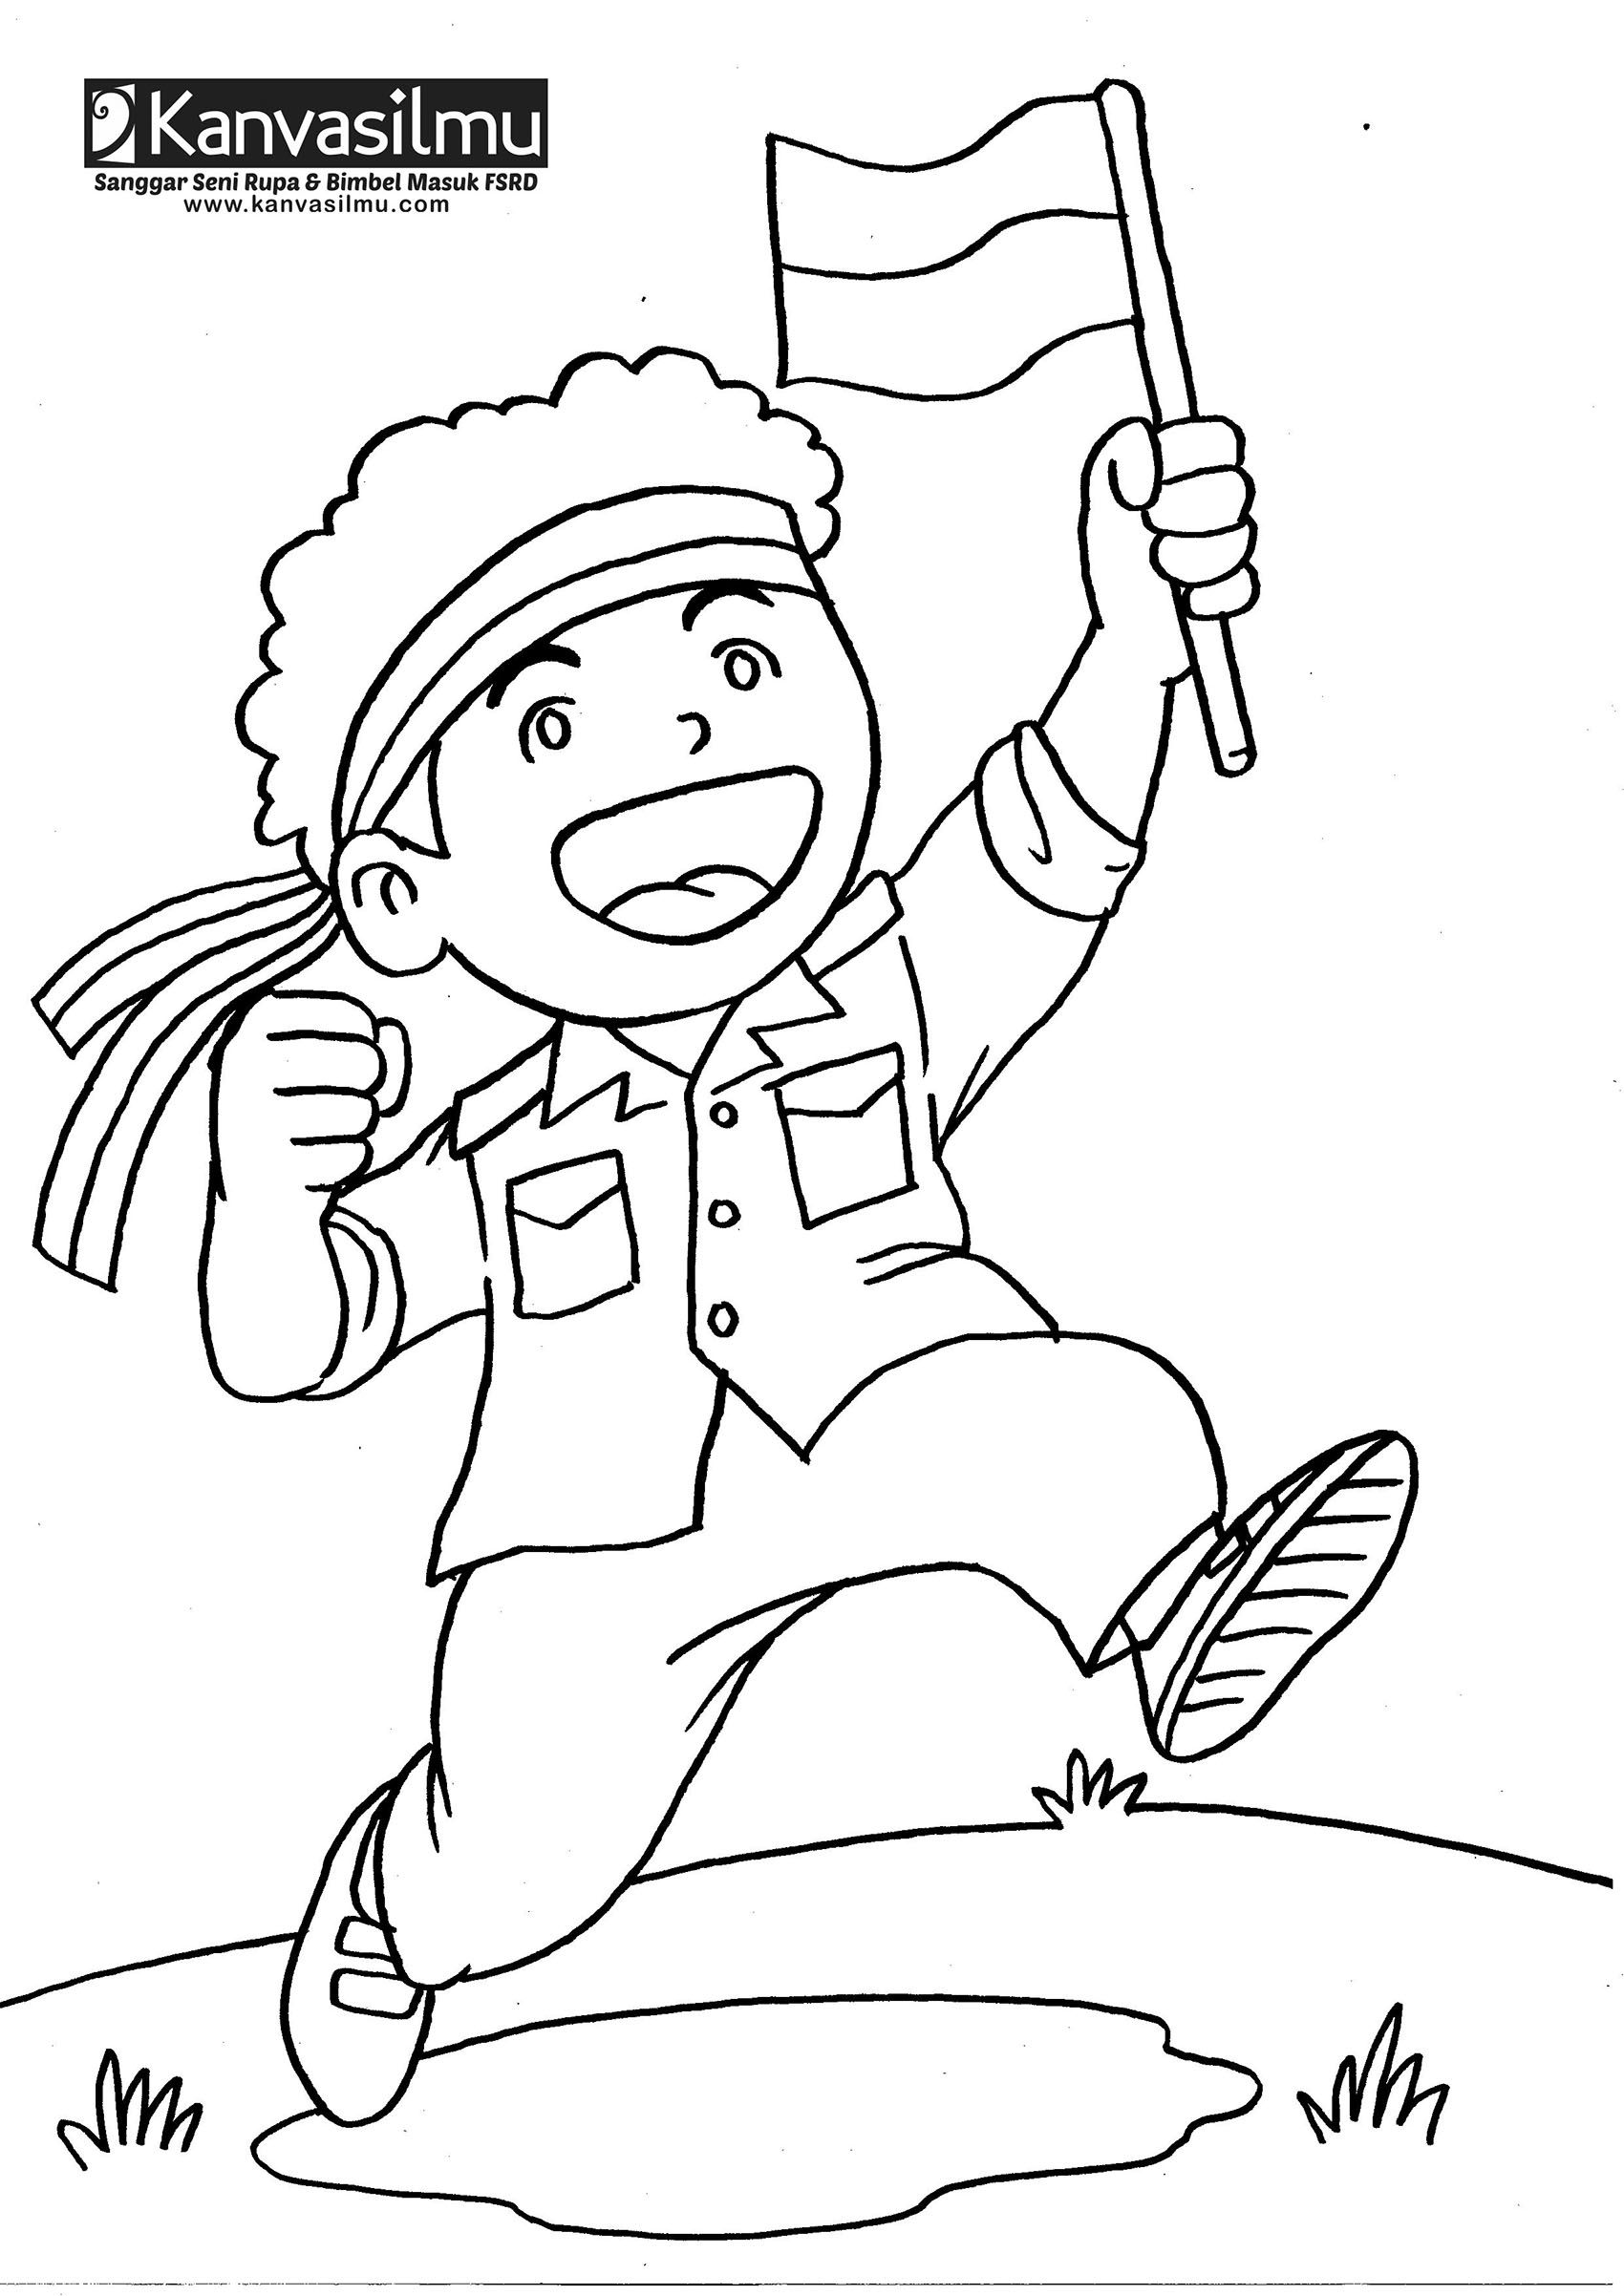 Gambar Sketsa Pahlawan Nasional Indonesia